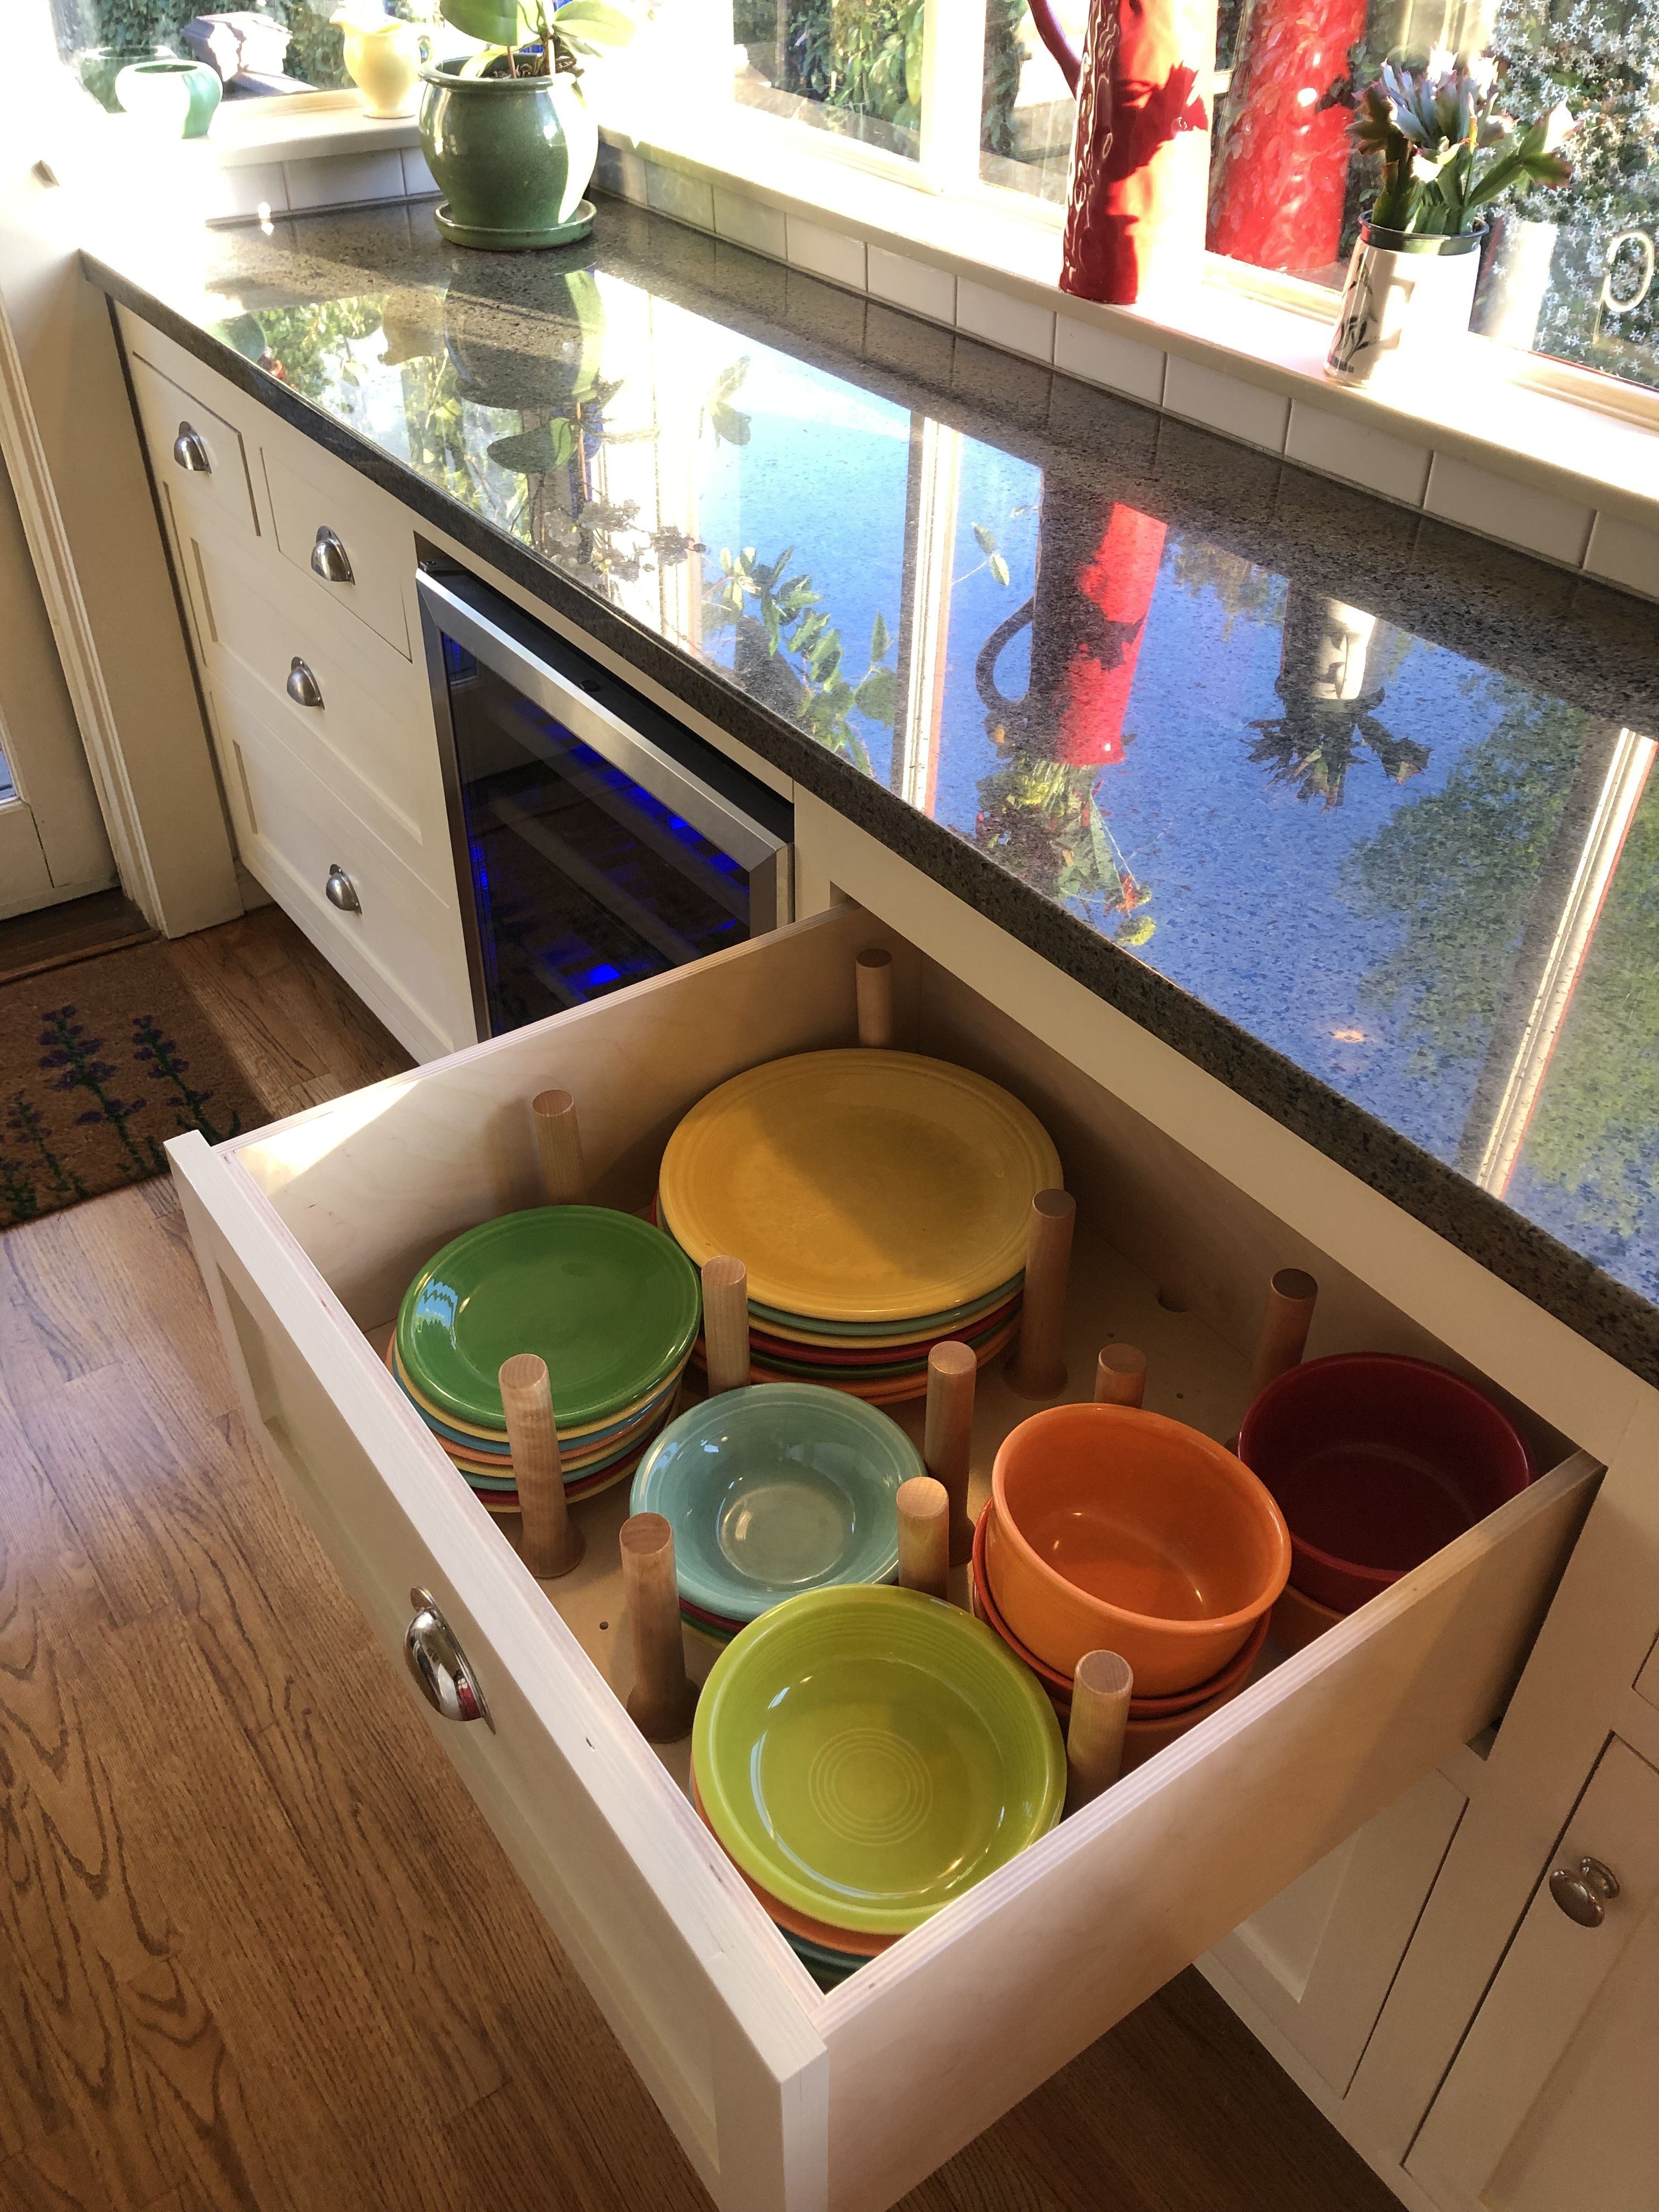 new peg and board storage dish drawer pegandboard kitchenorganization board storage kitchen on kitchen organization dishes id=51196